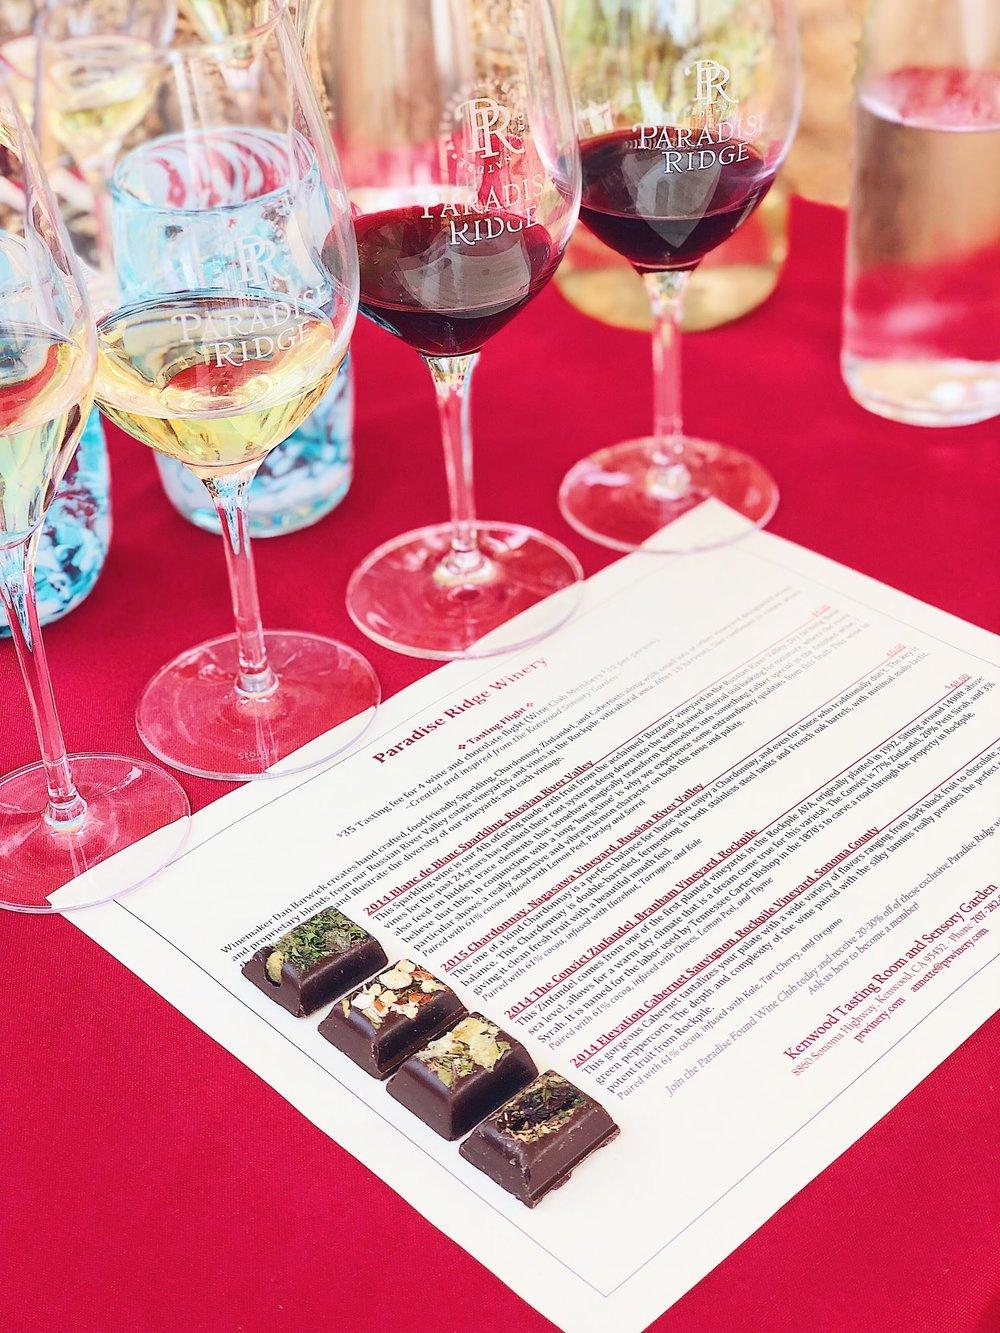 Paradise Ridge Winery Sensory Experience